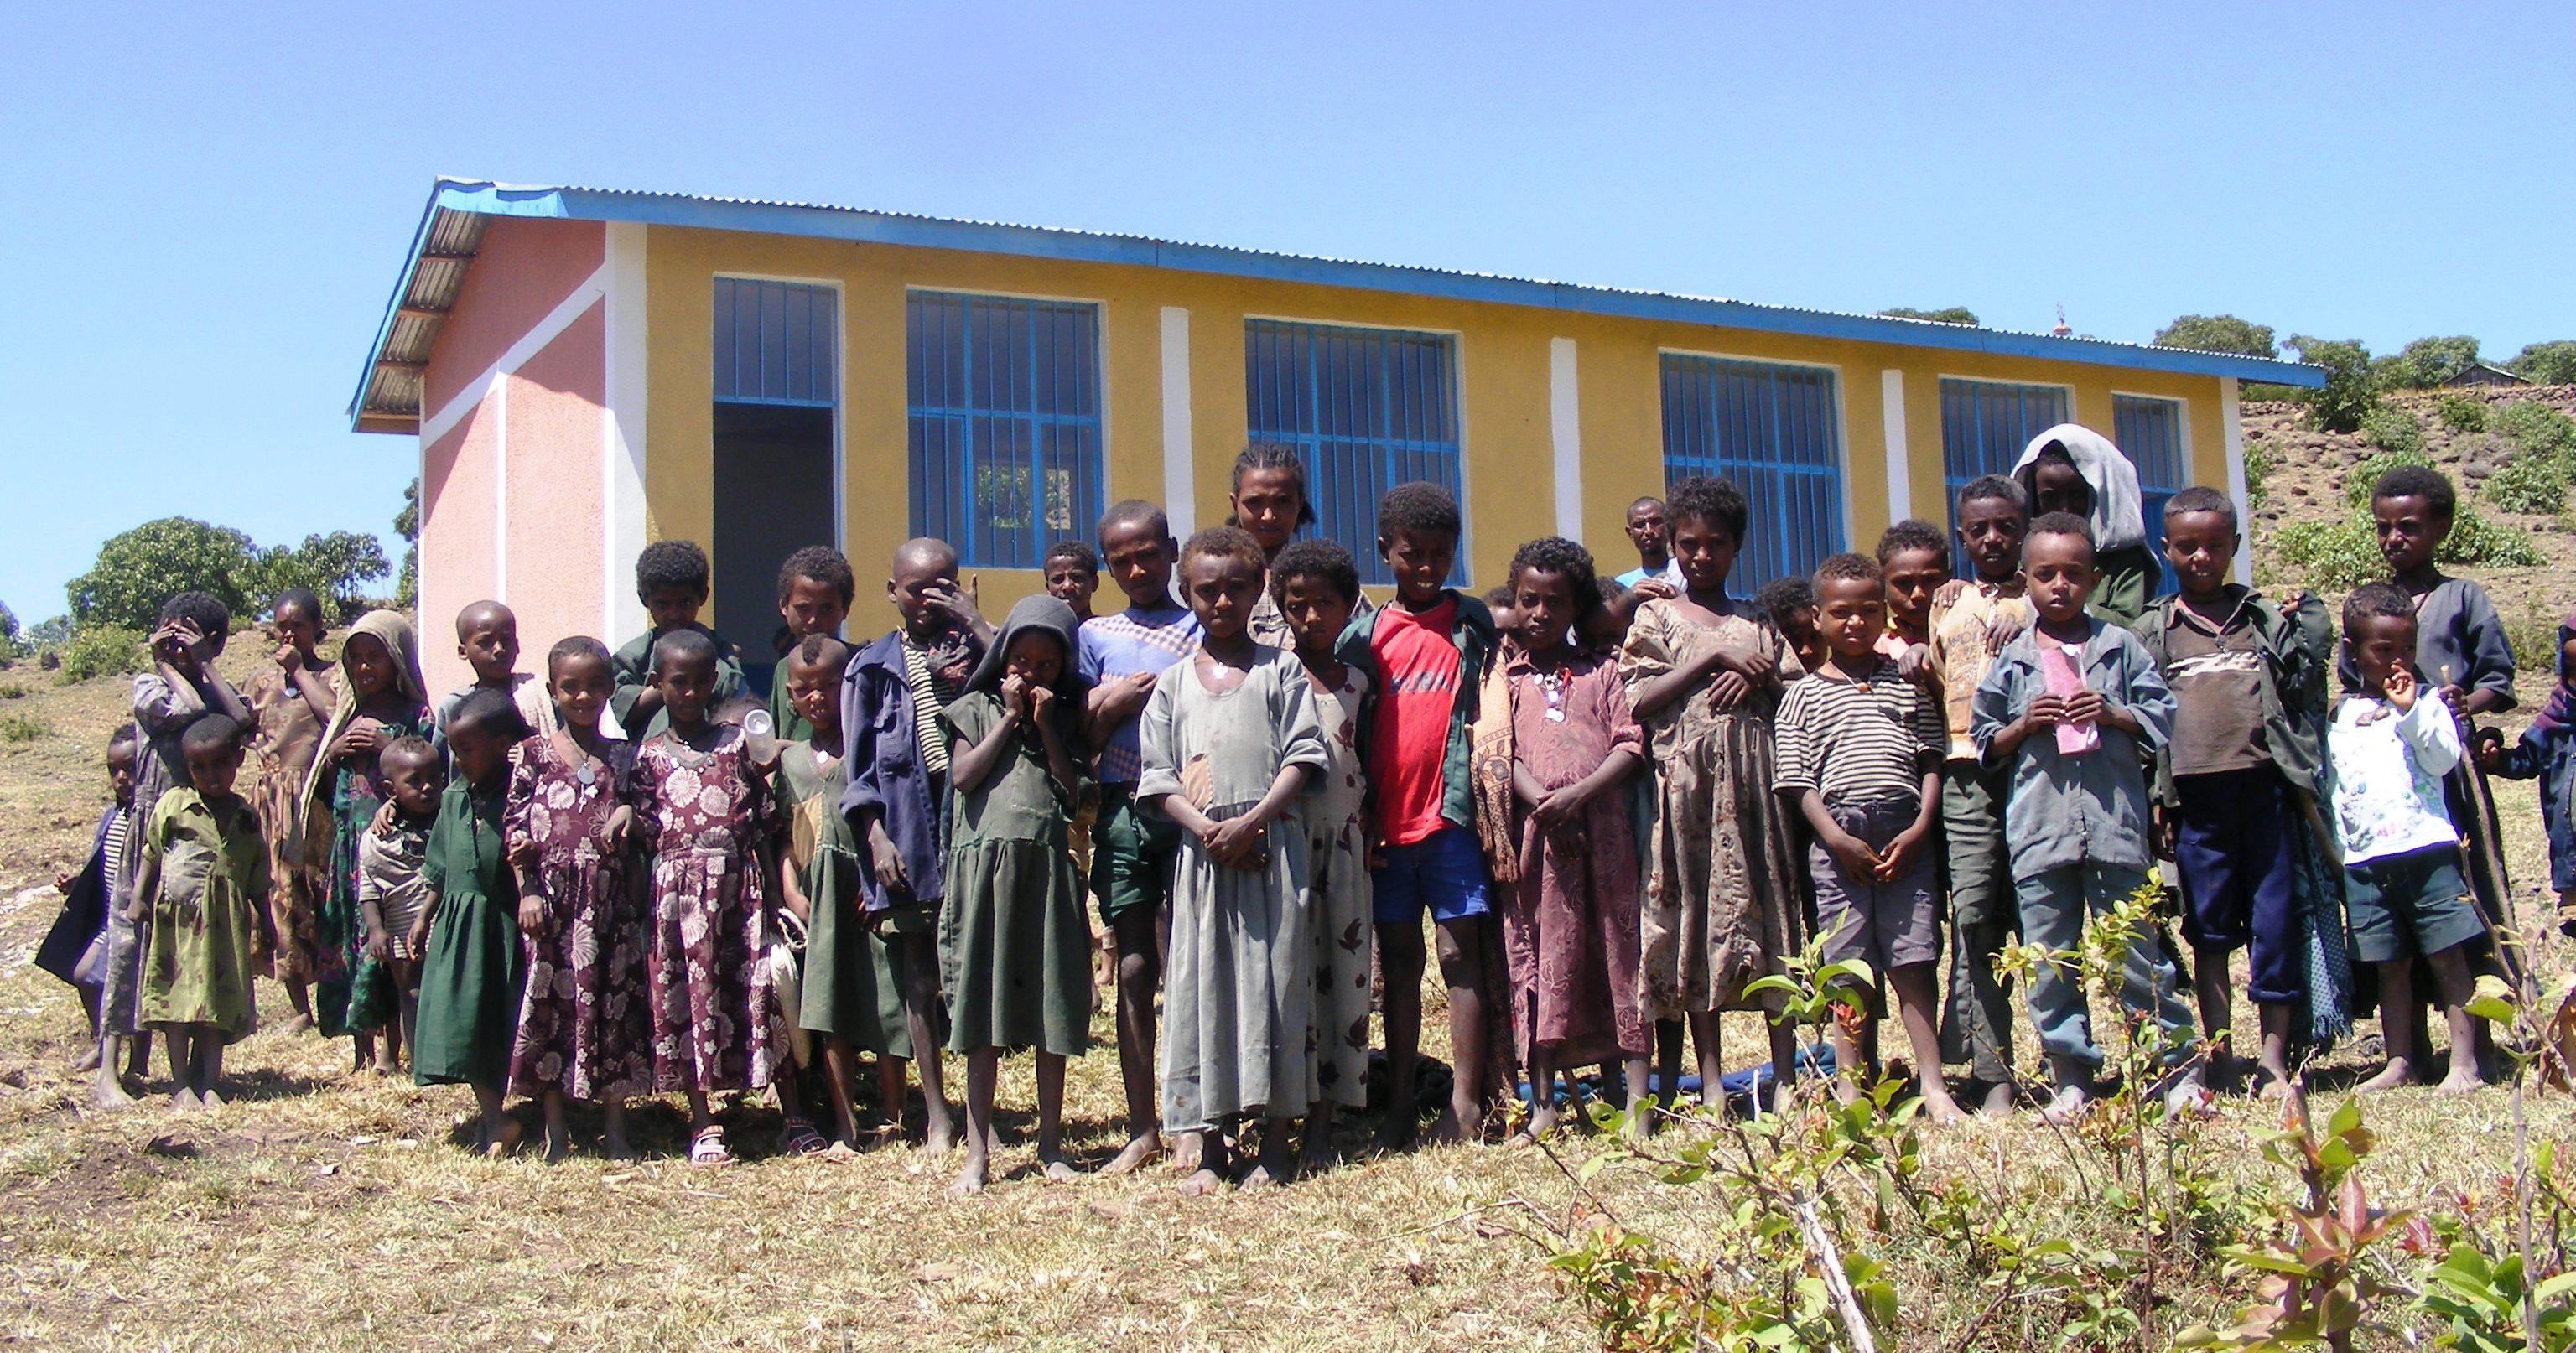 Gebru Warka Primary School | Barak Raviv Foundation